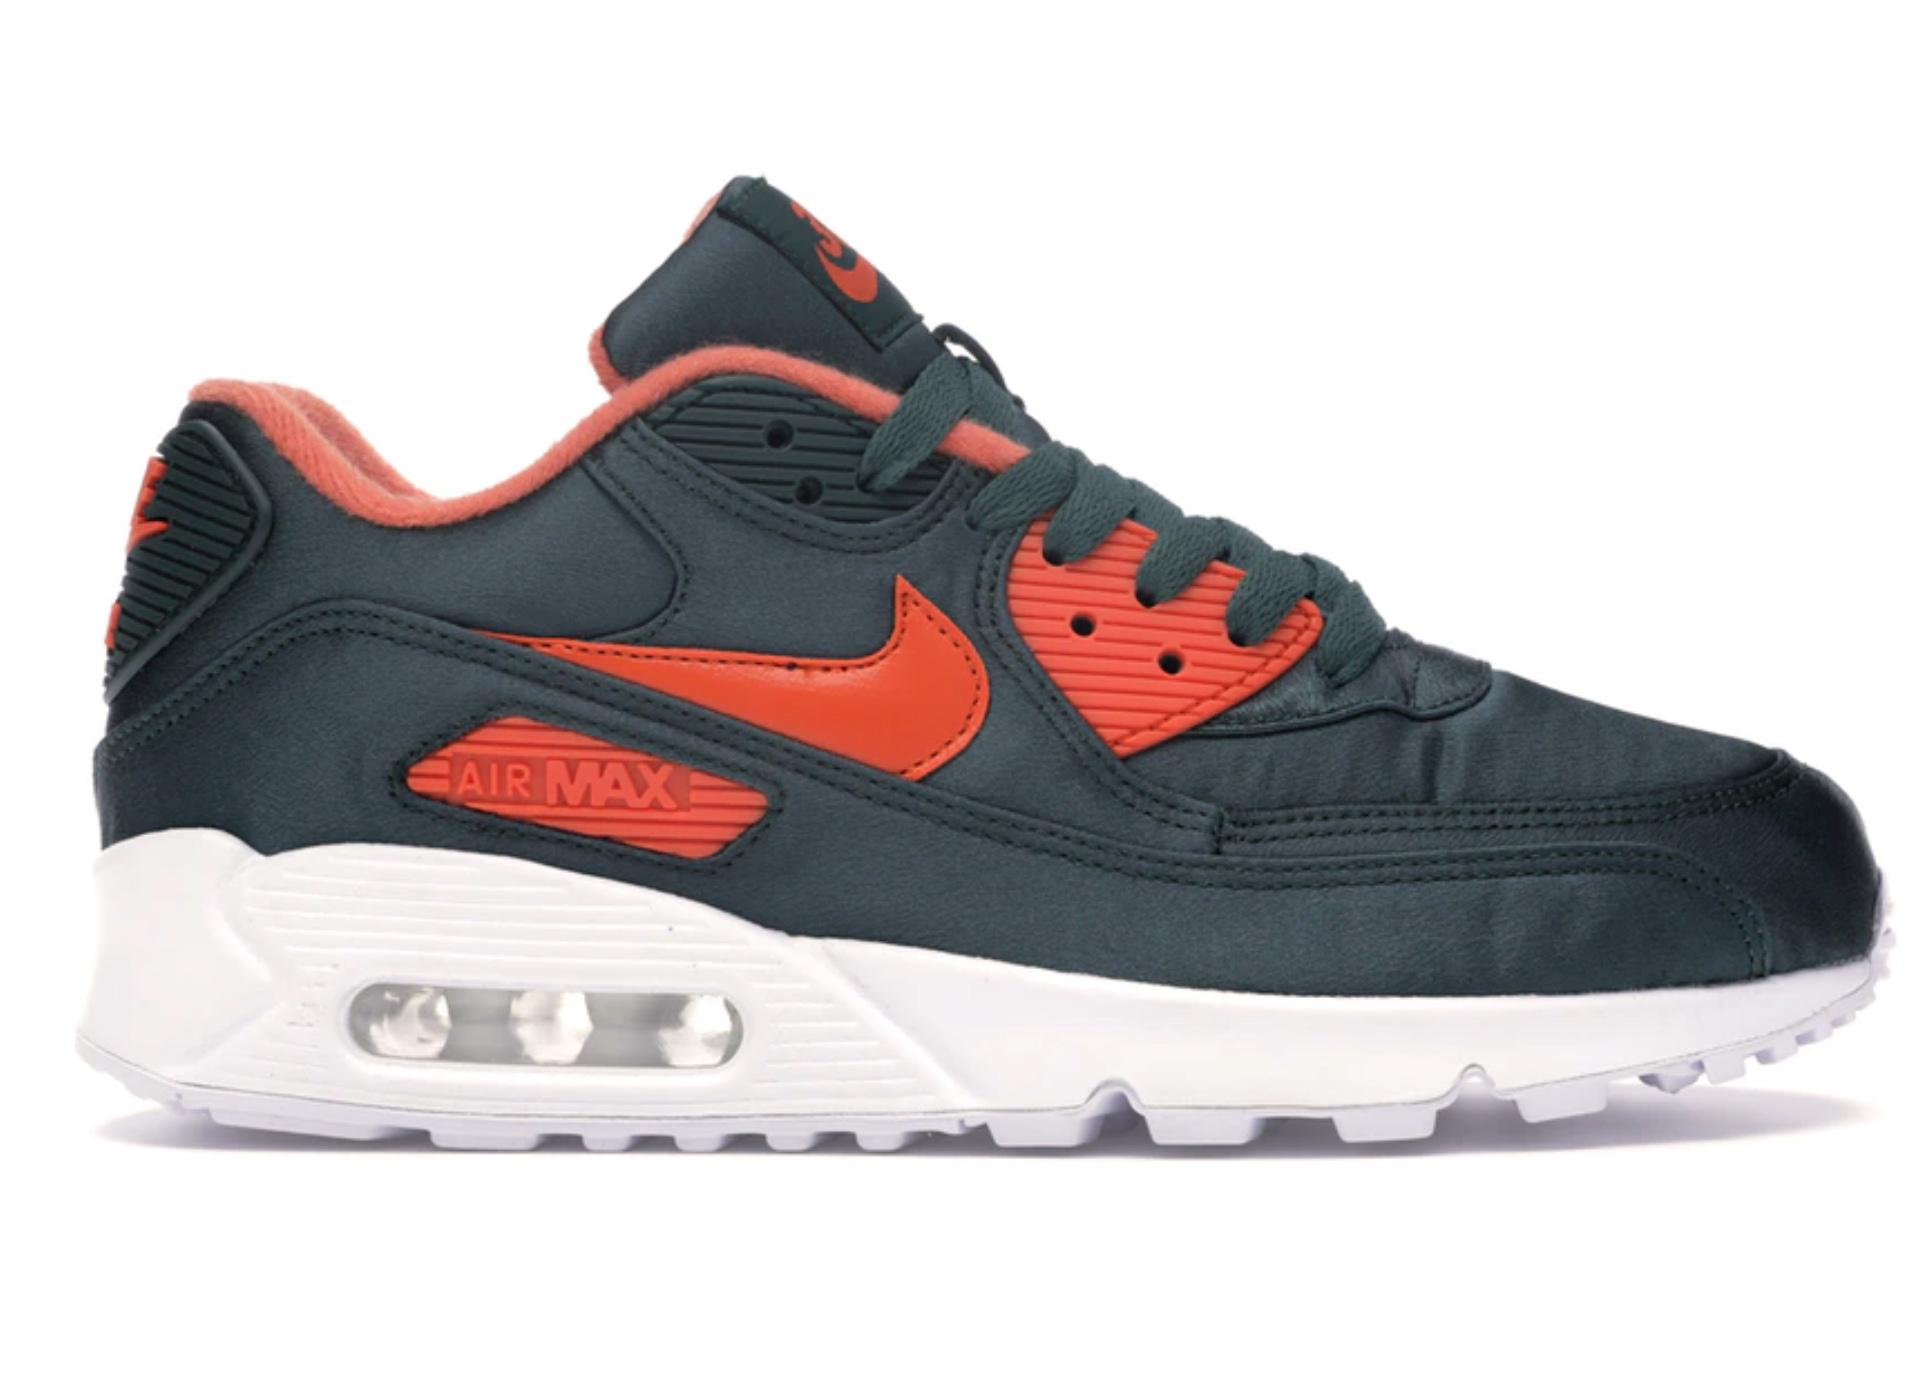 Nike Air Max 90 Unknwn Miami 305 - MIA305FL